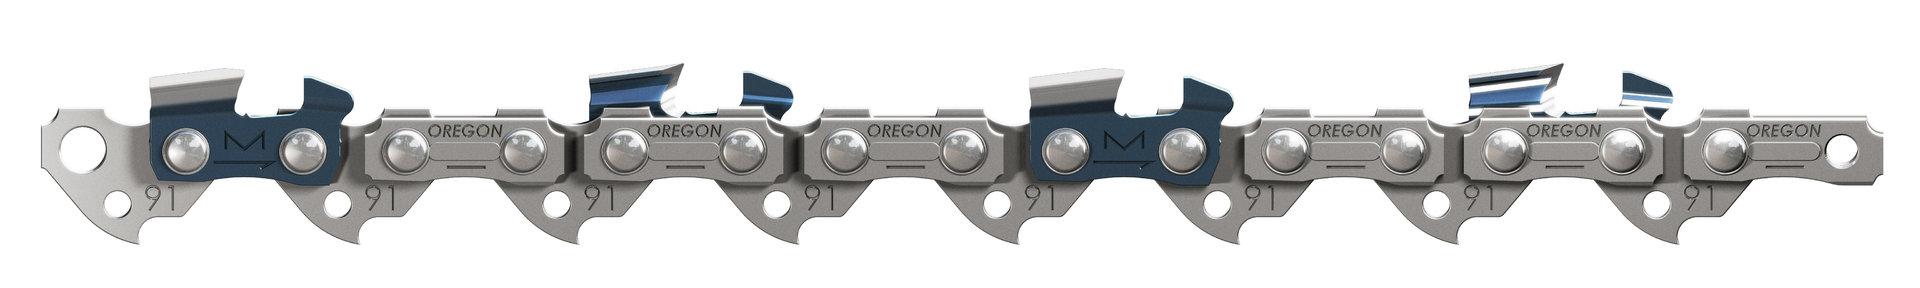 m91vxl052e oregon s gekette multicut 3 8 1 3 mm 52 tg. Black Bedroom Furniture Sets. Home Design Ideas